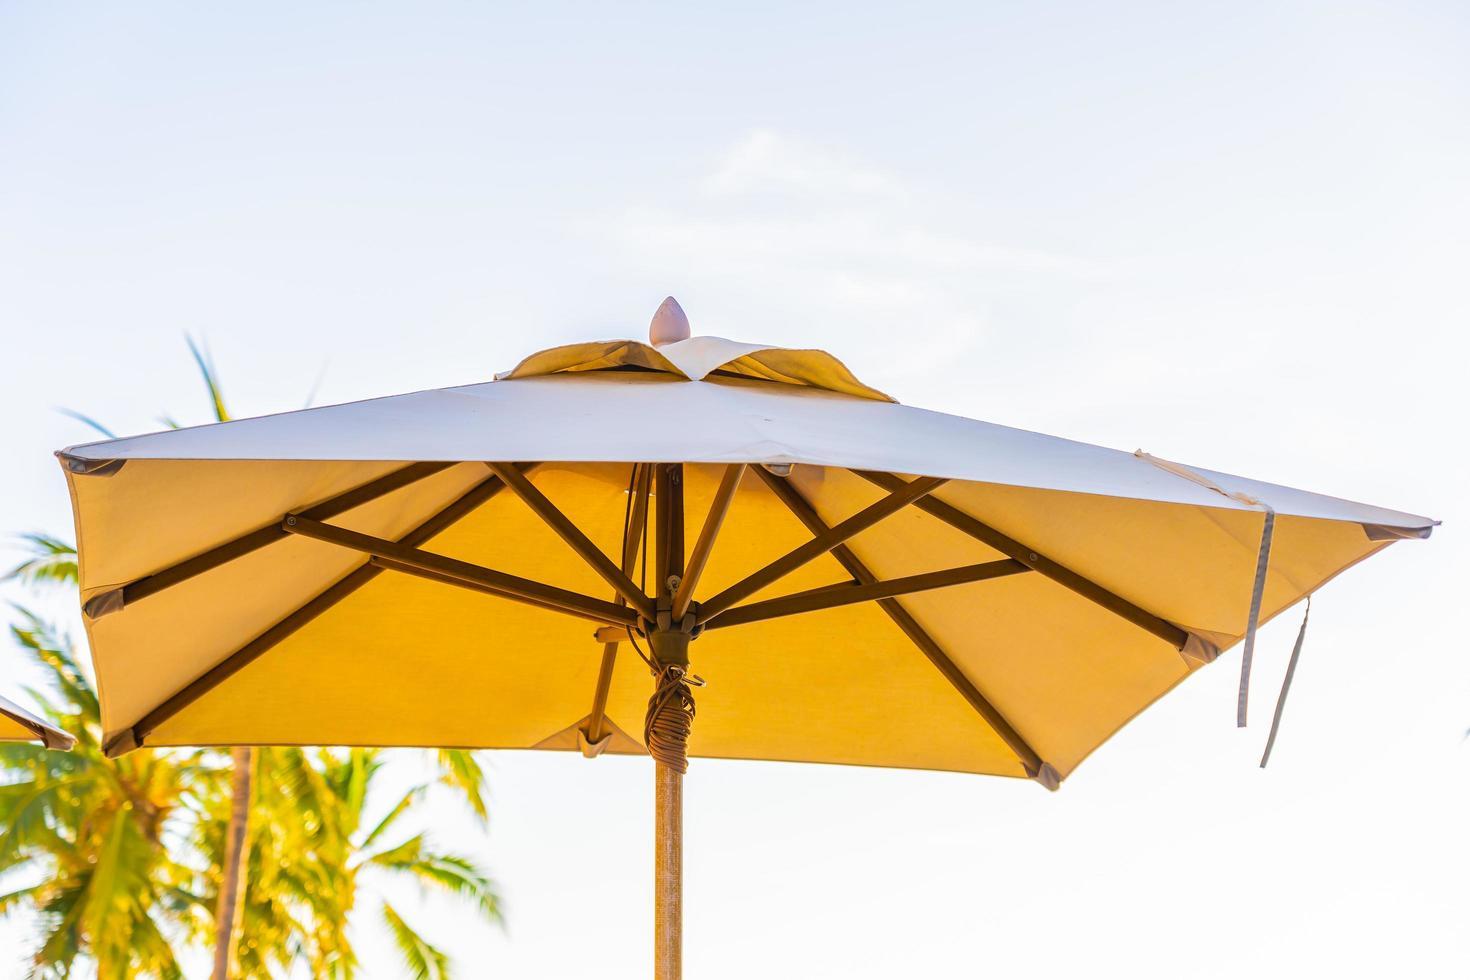 Beautiful tropical nature and umbrella photo